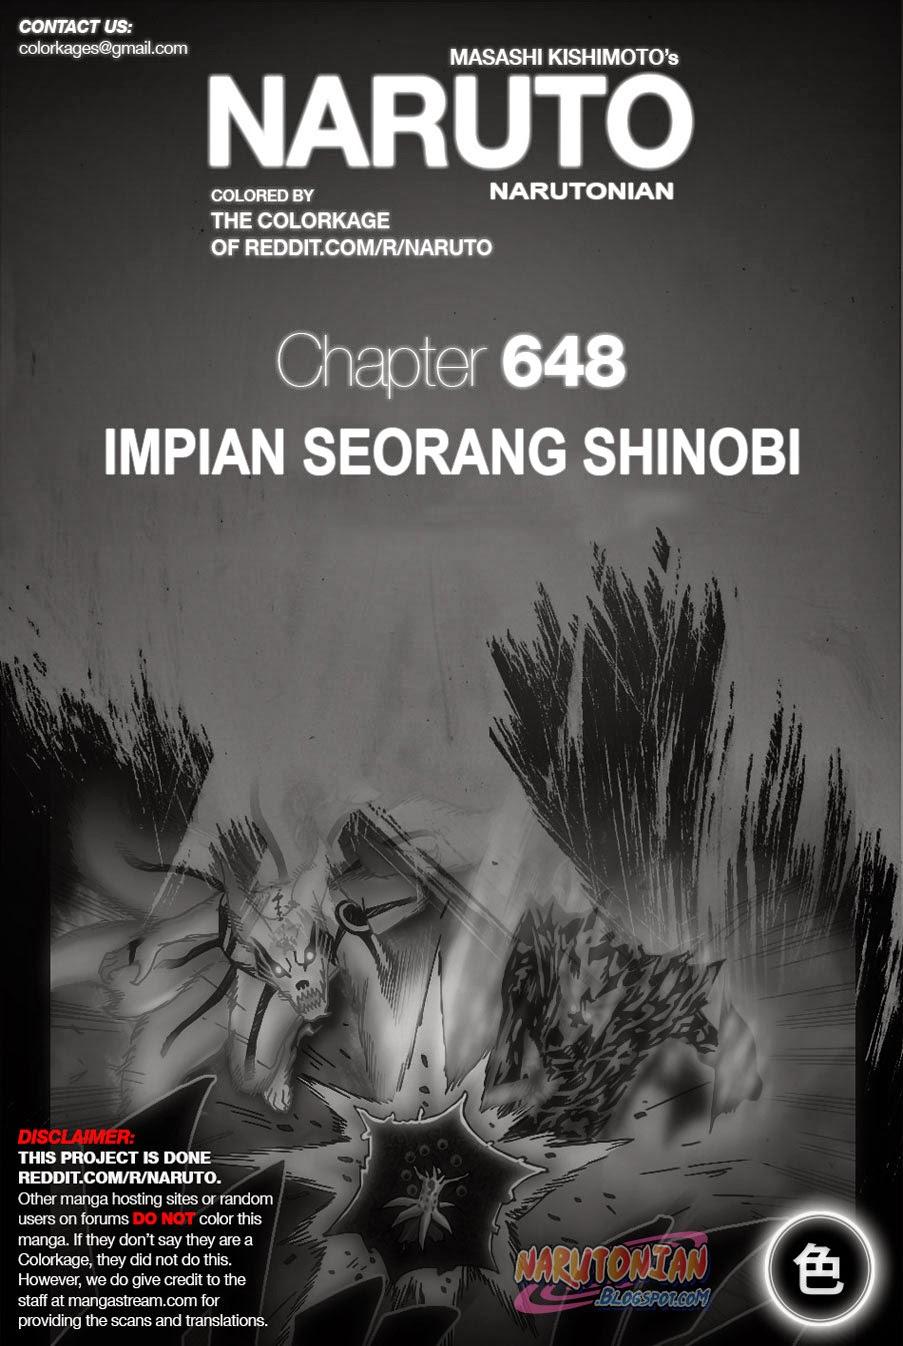 Dilarang COPAS - situs resmi www.mangacanblog.com - Komik naruto berwarna 648 - impian seorang shinobi 649 Indonesia naruto berwarna 648 - impian seorang shinobi Terbaru 0|Baca Manga Komik Indonesia|Mangacan